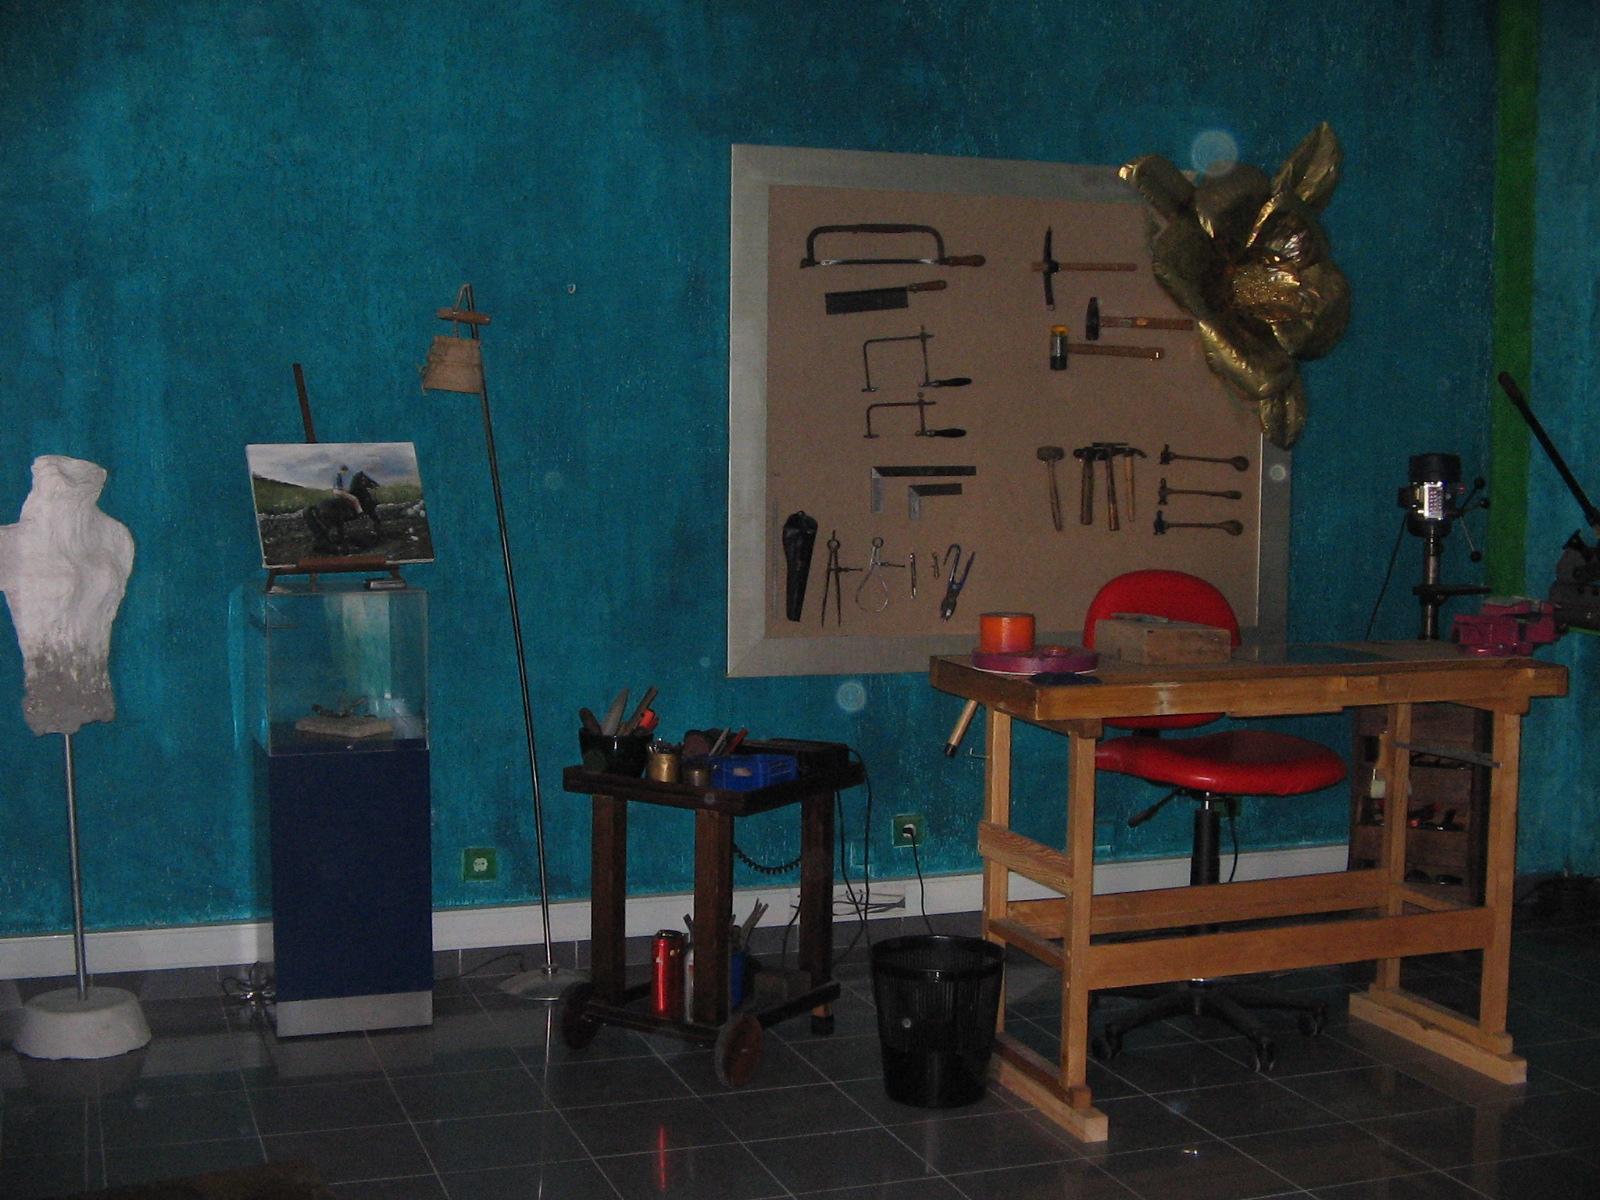 Oficina e Galeria